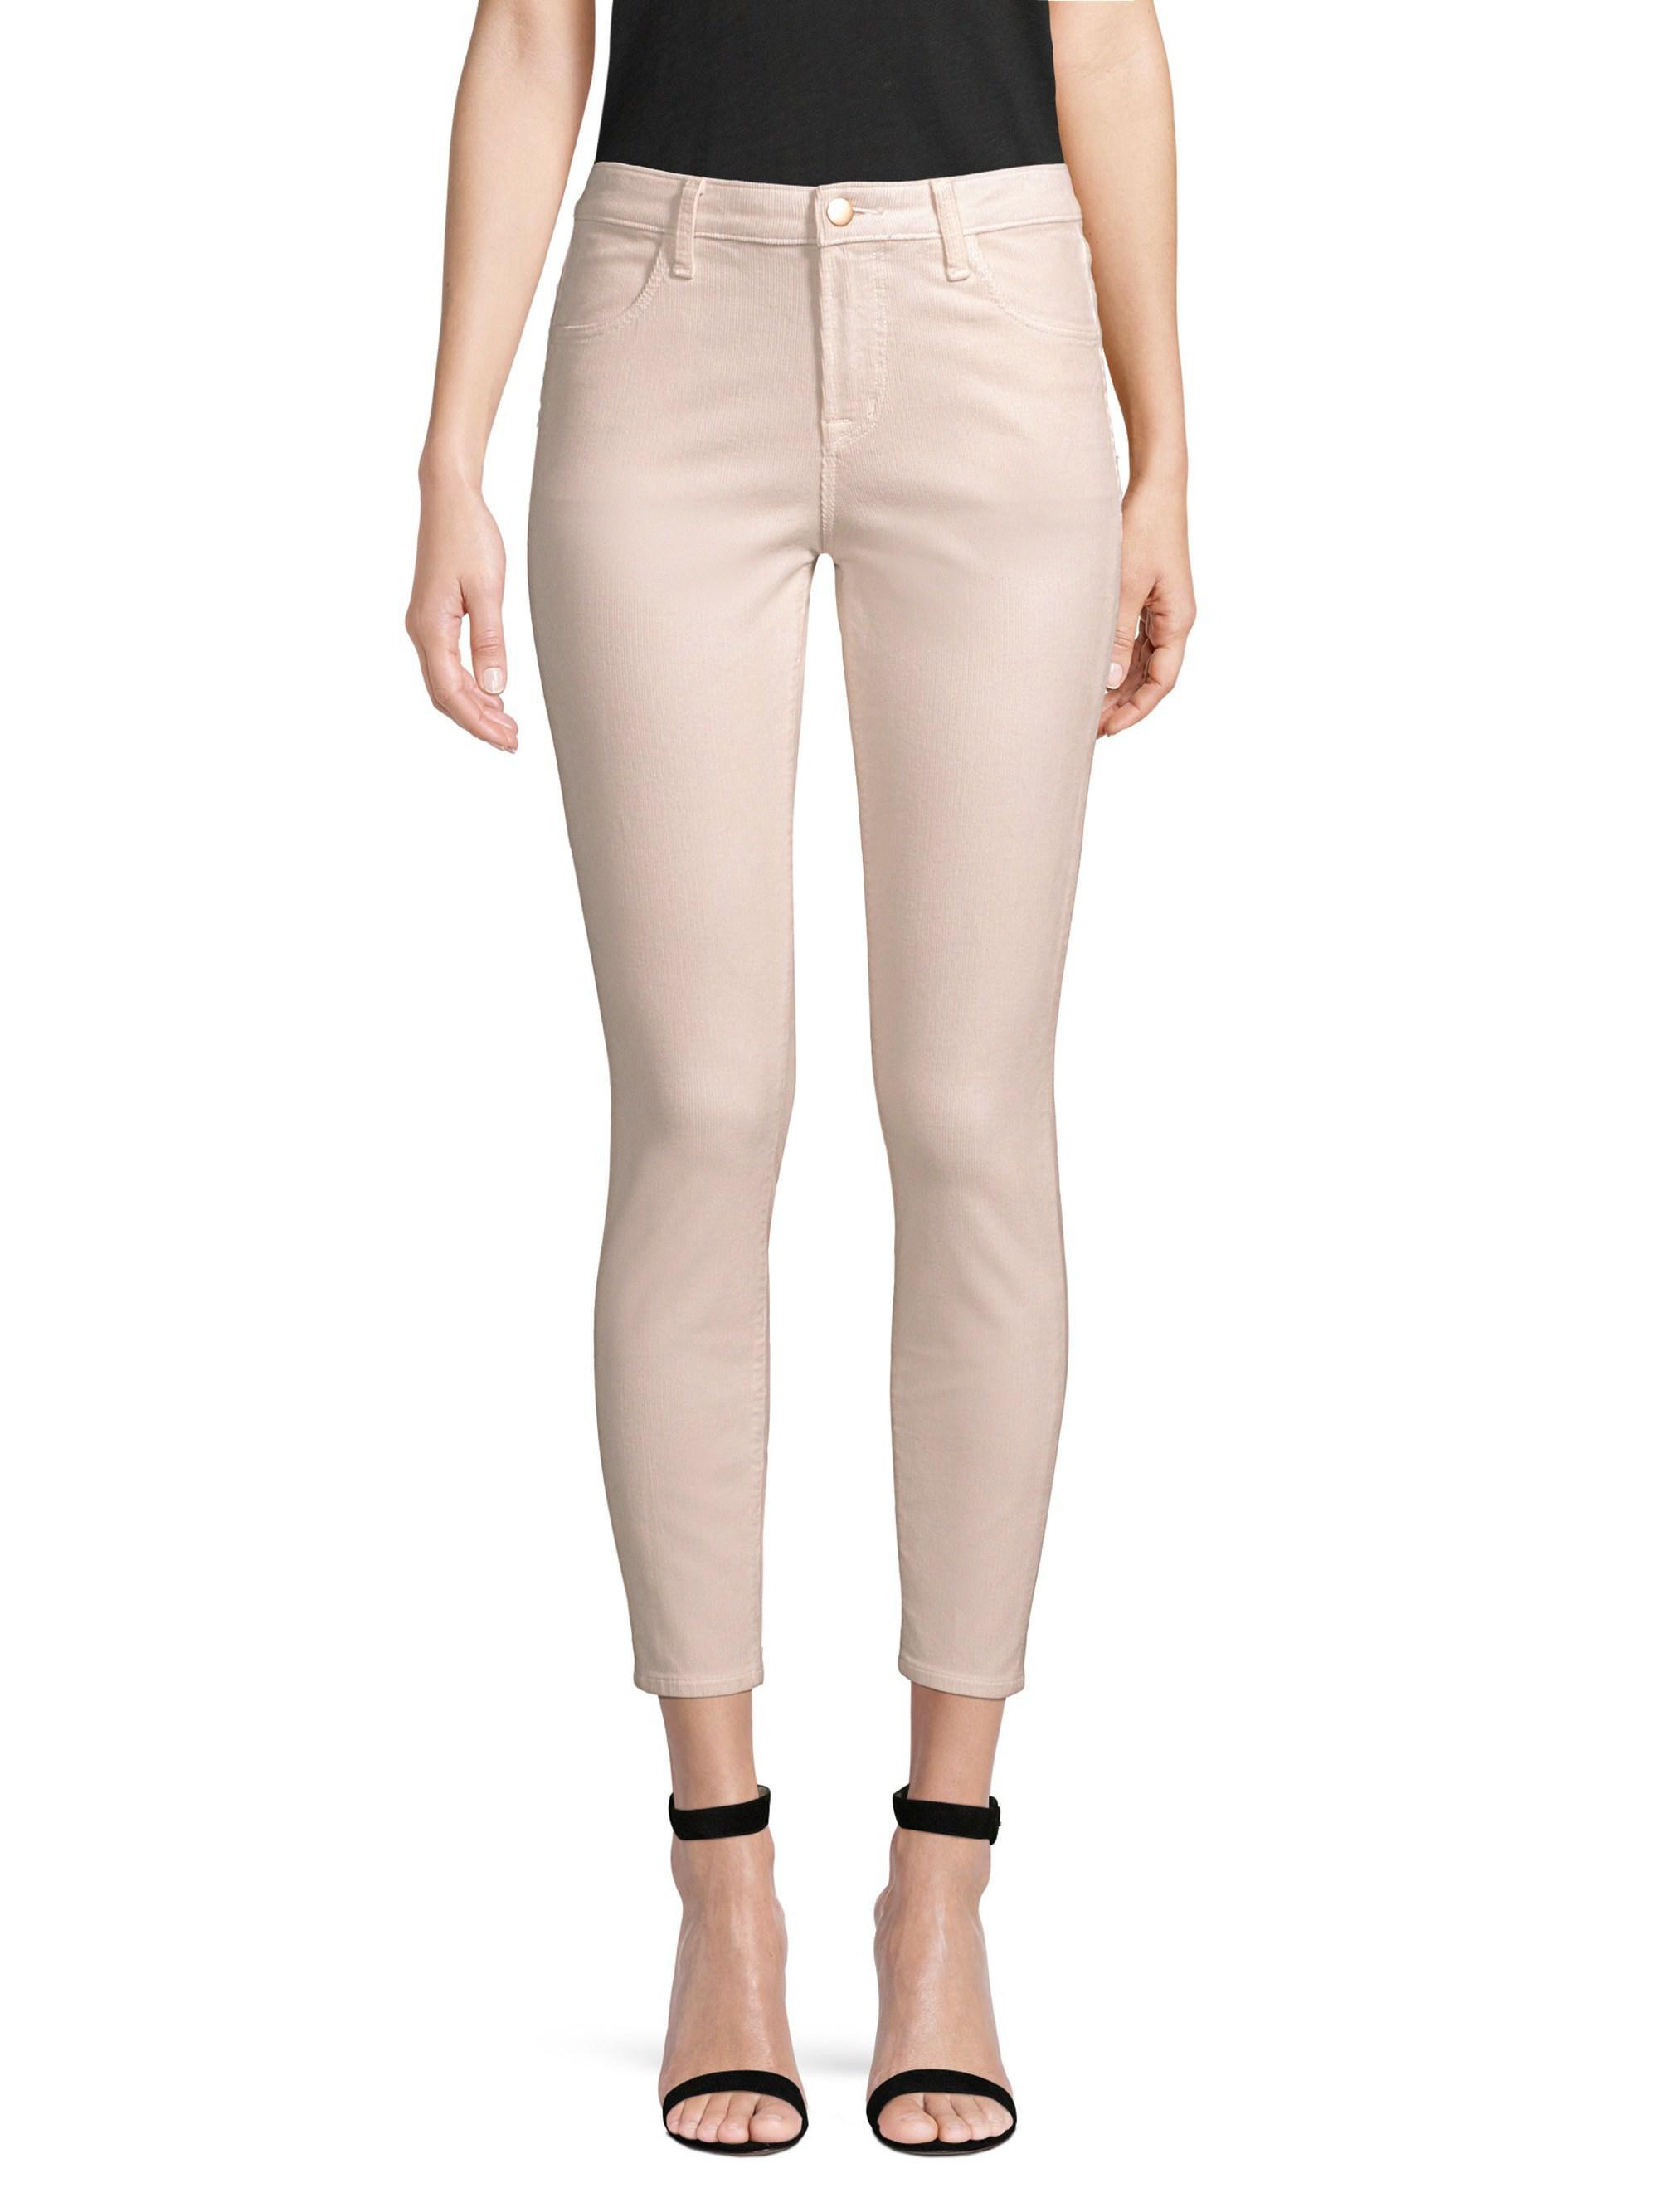 70eebea2547 J Brand. Women s Alana Corduroy Skinny Trousers. £165 £99 From Saks Fifth  Avenue